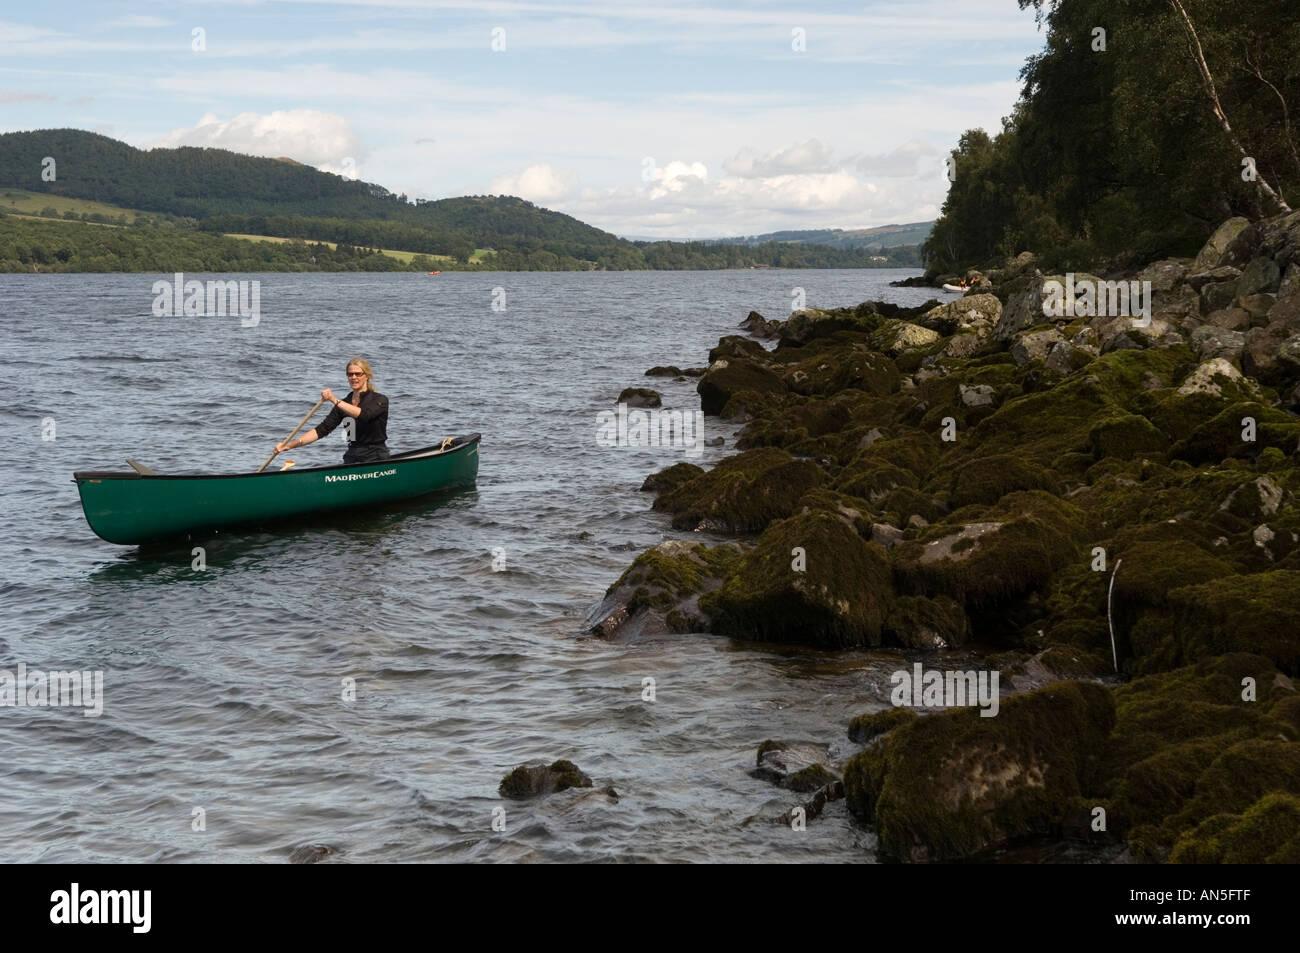 Diane Alger paddling a Mad River Canoe Explorer 16 on